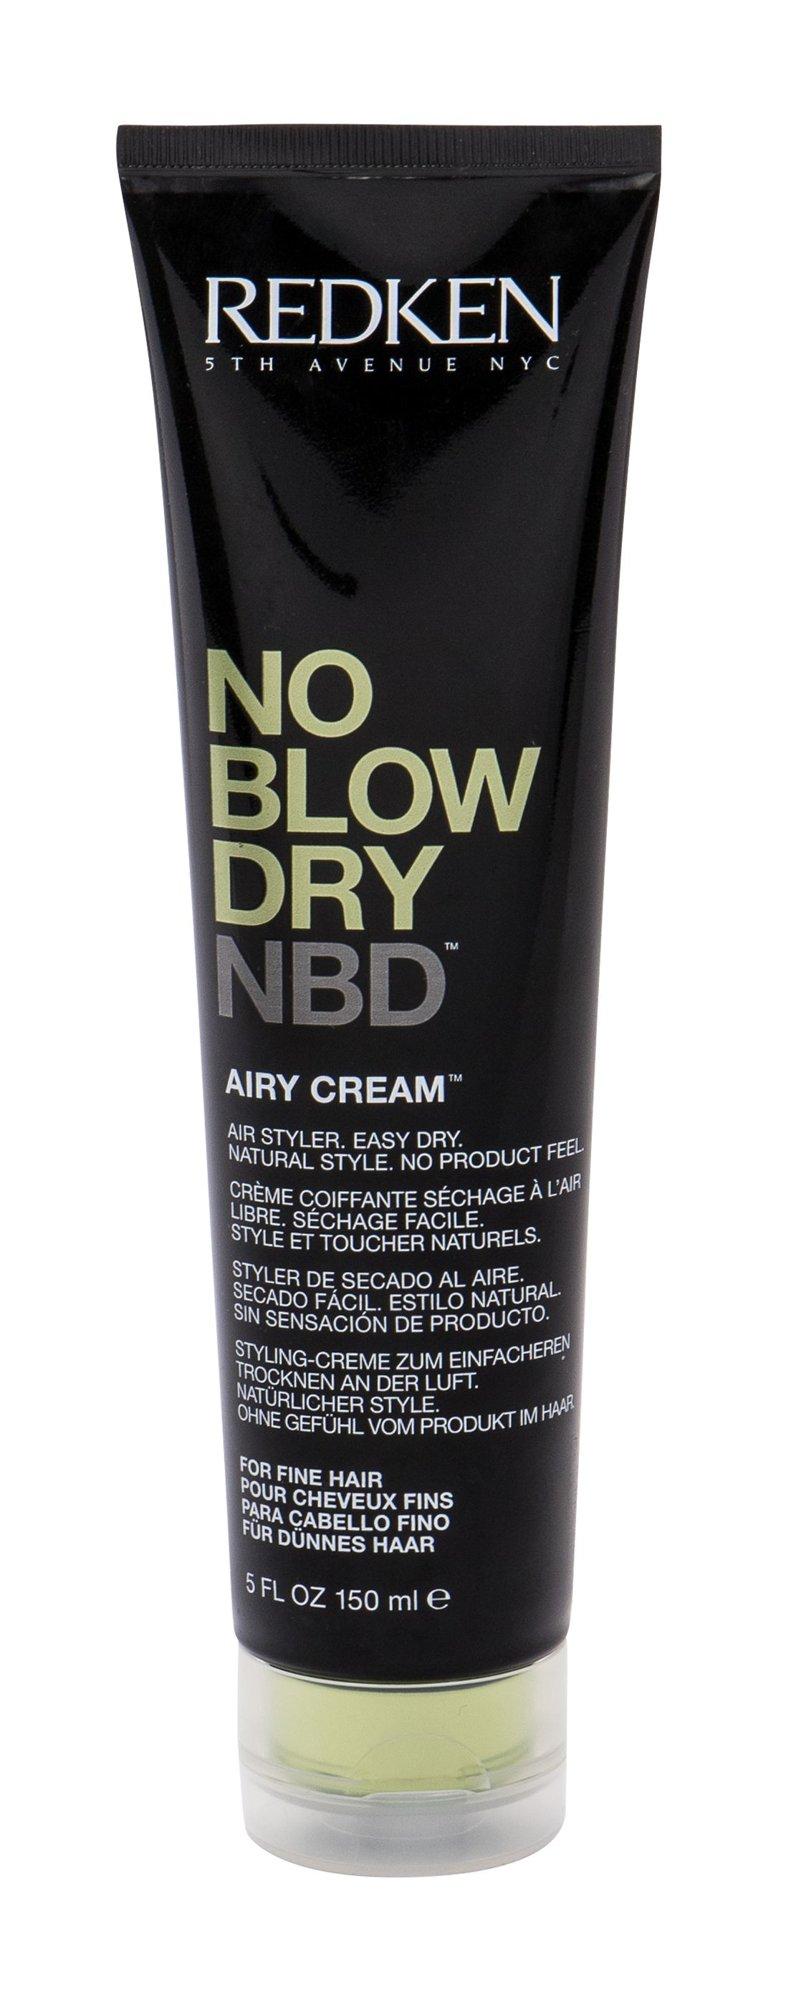 Redken No Blow Dry Hair Cream 150ml